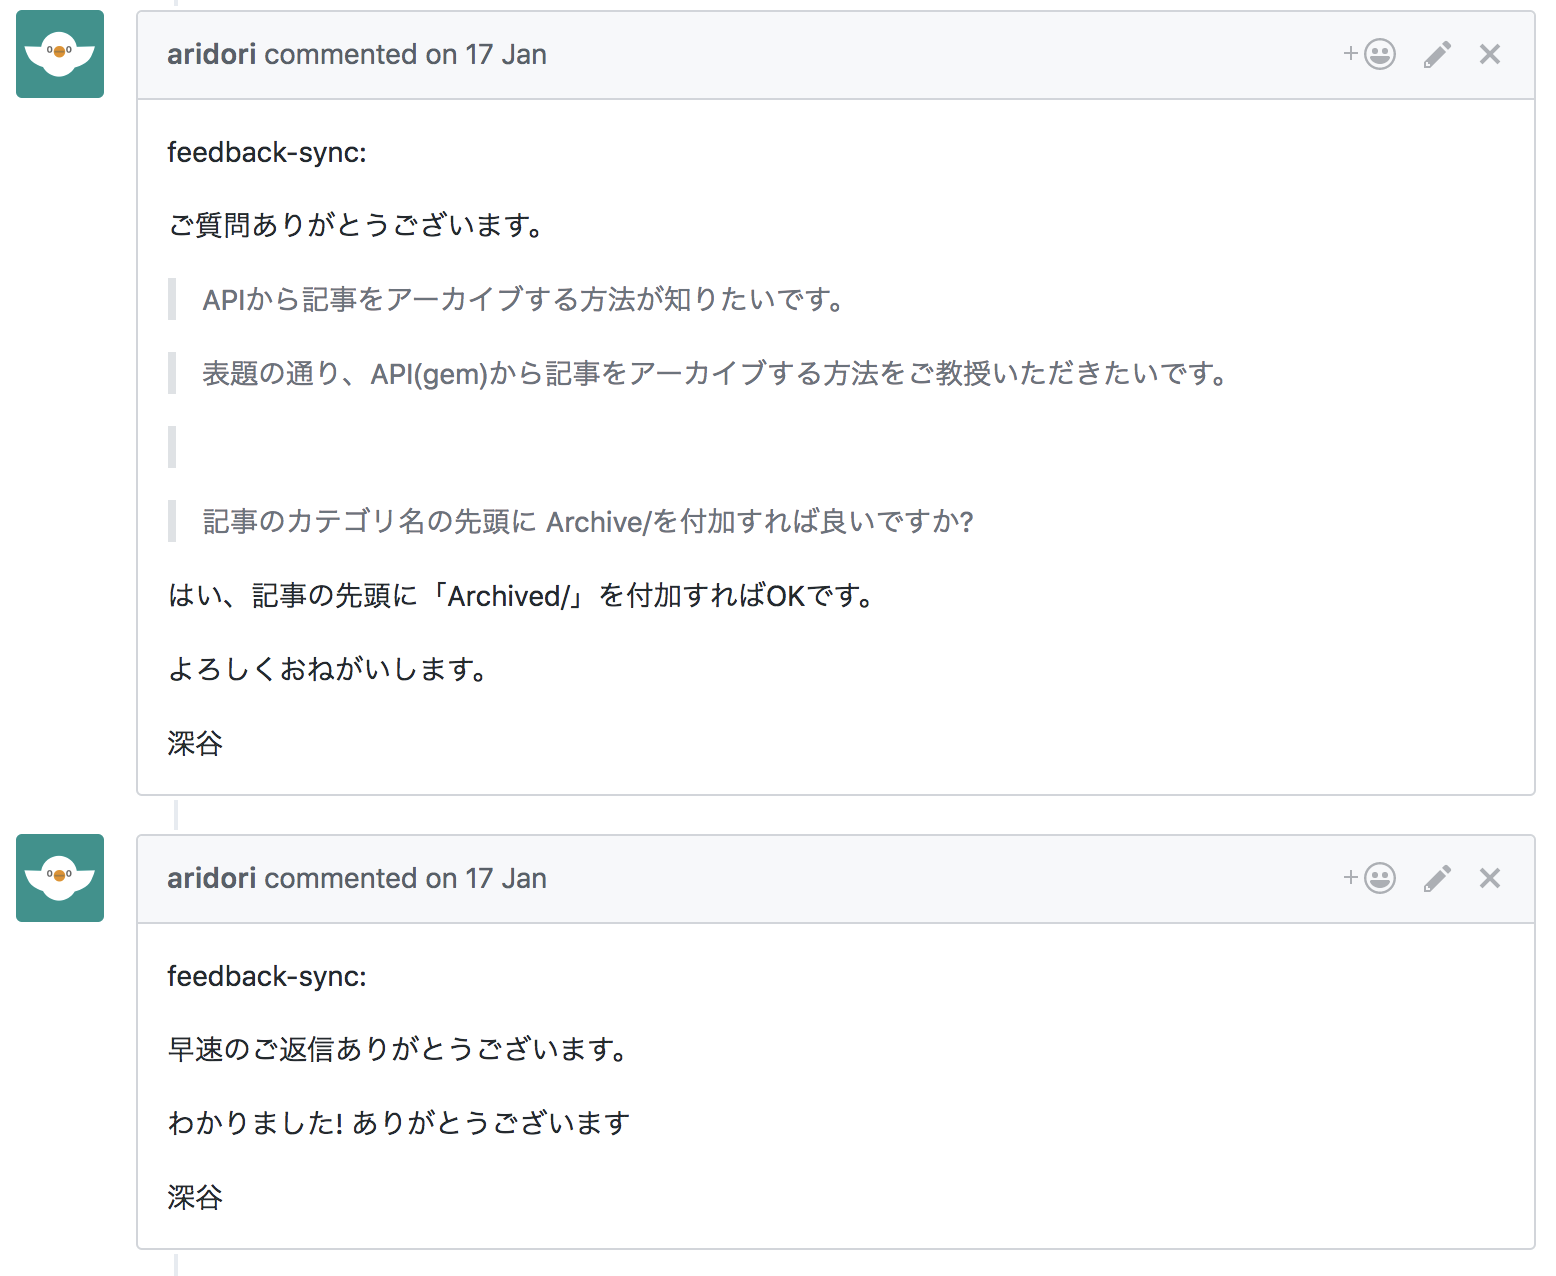 APIでのArchive化の問い合わせ